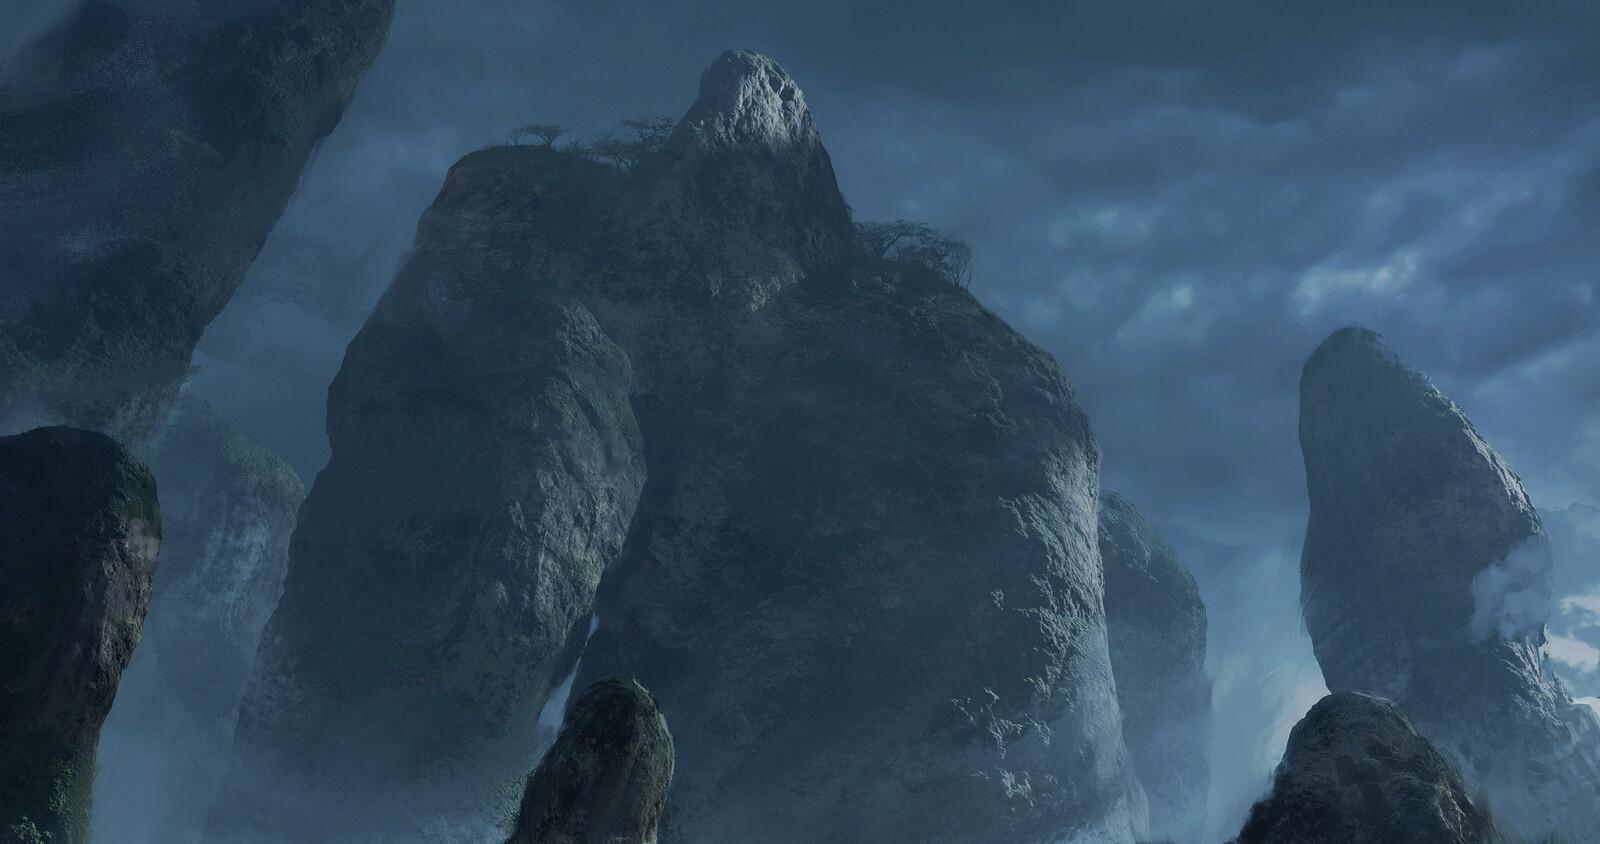 Blender: Procedural Mountains Shader